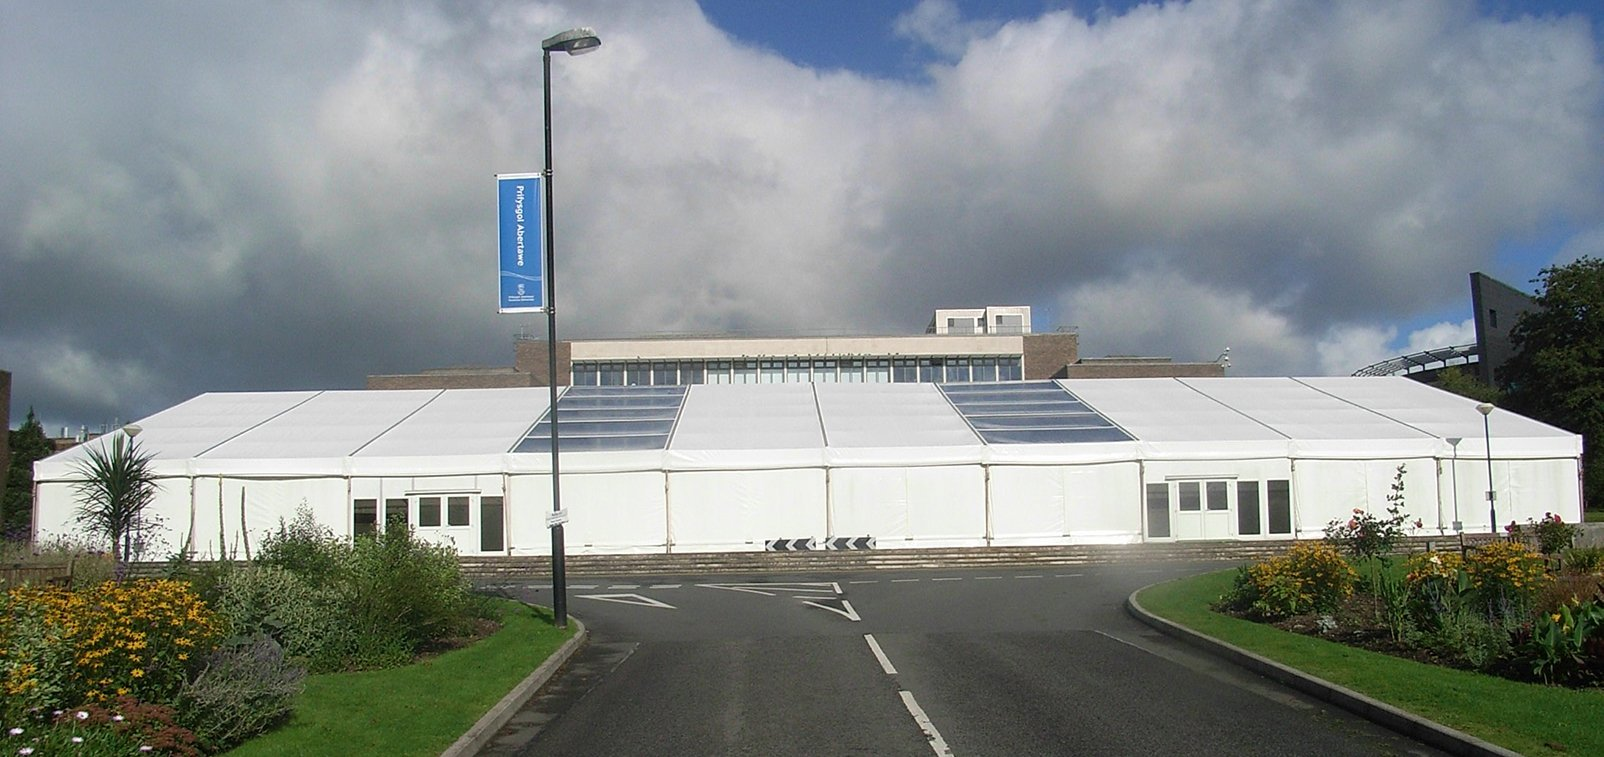 Swansea University Freshers Week